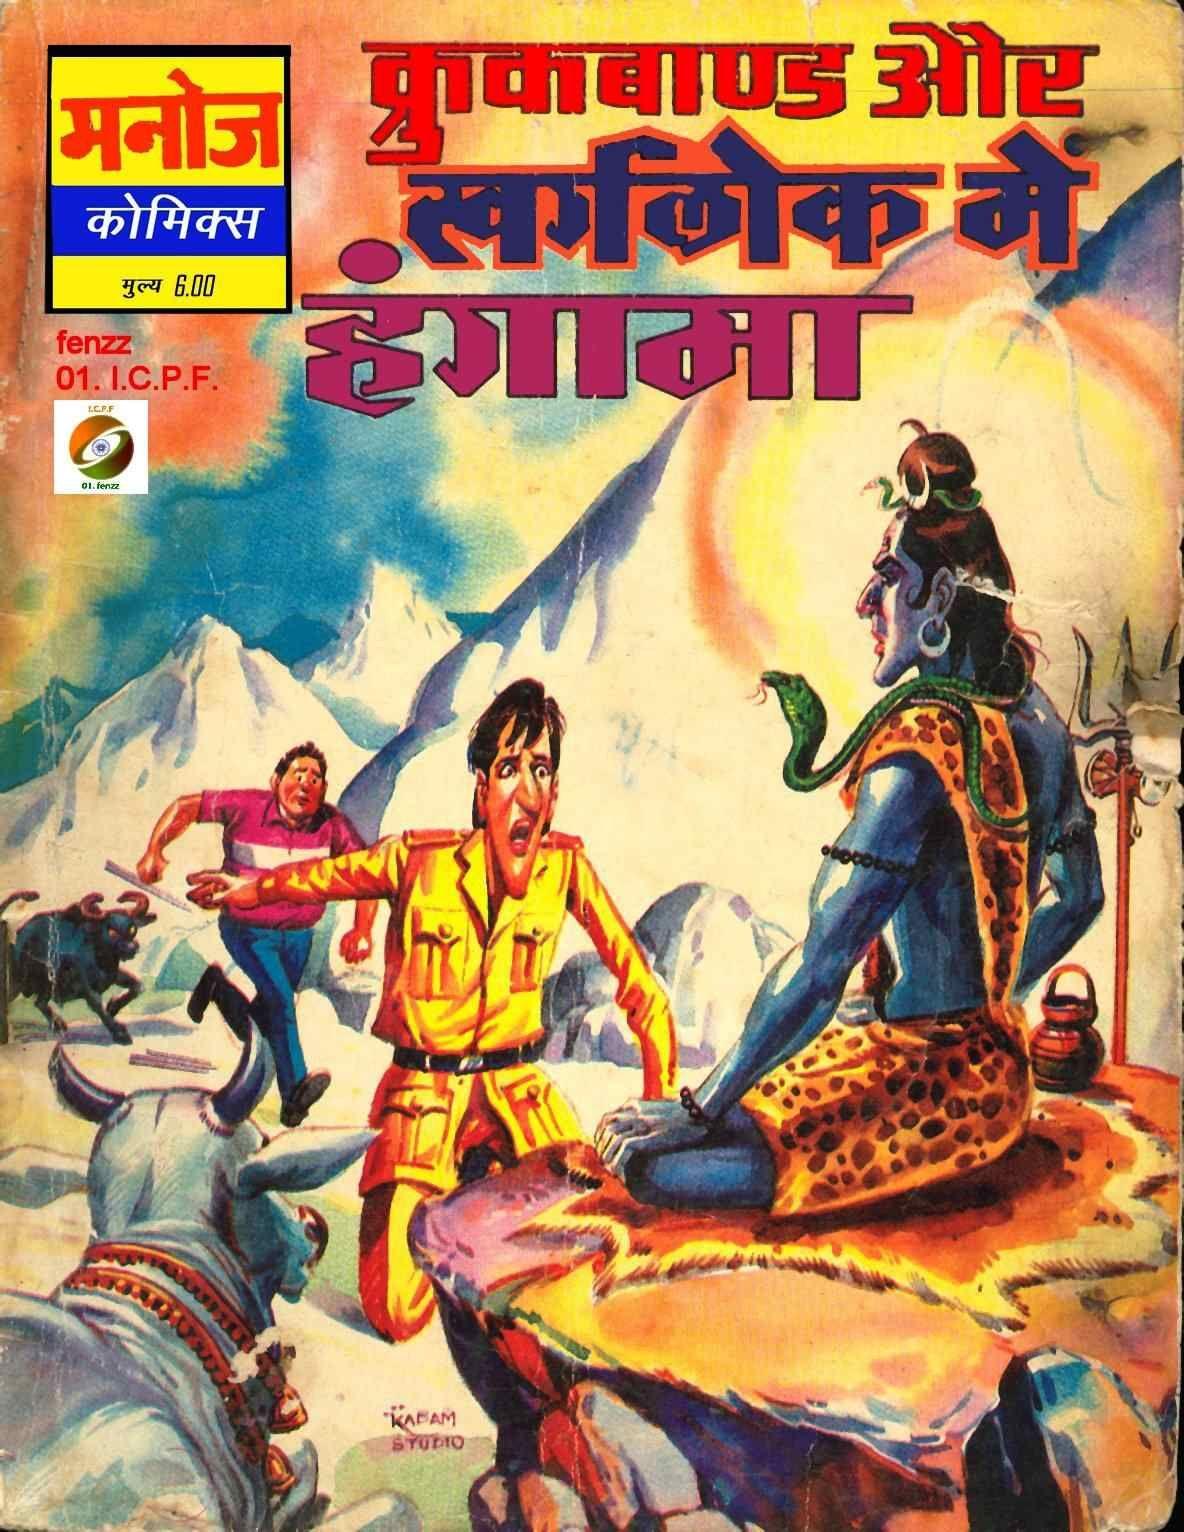 Character 'crookbond' From Manoj